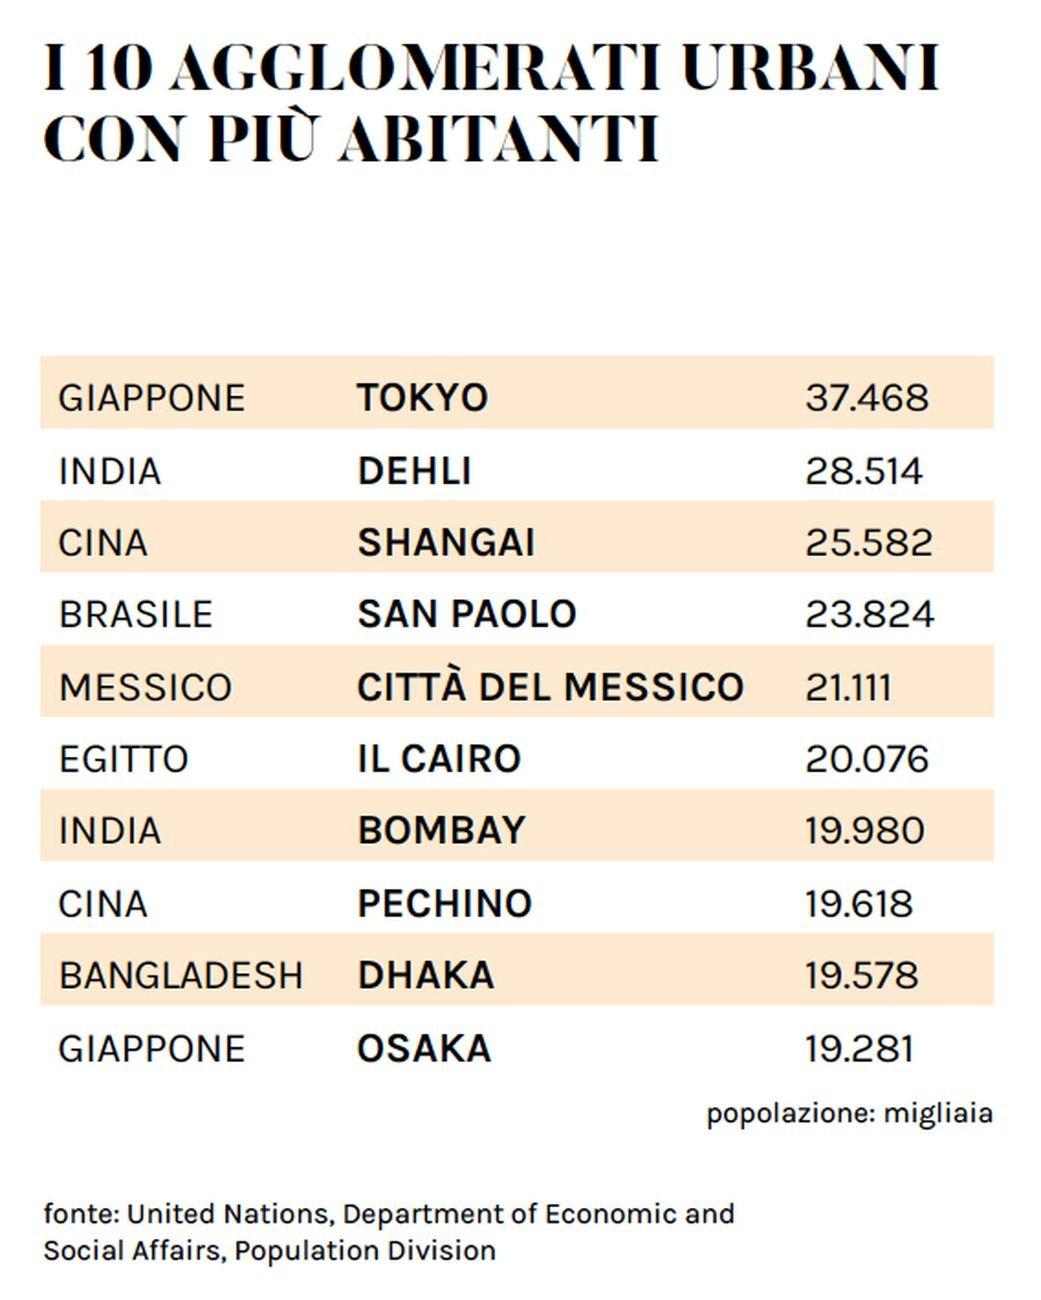 I 10 agglomerati urbani con più abitanti. Fonte United Nations, Department of Economic and Social Affairs, Population Division. Infografica © Artribune Magazine